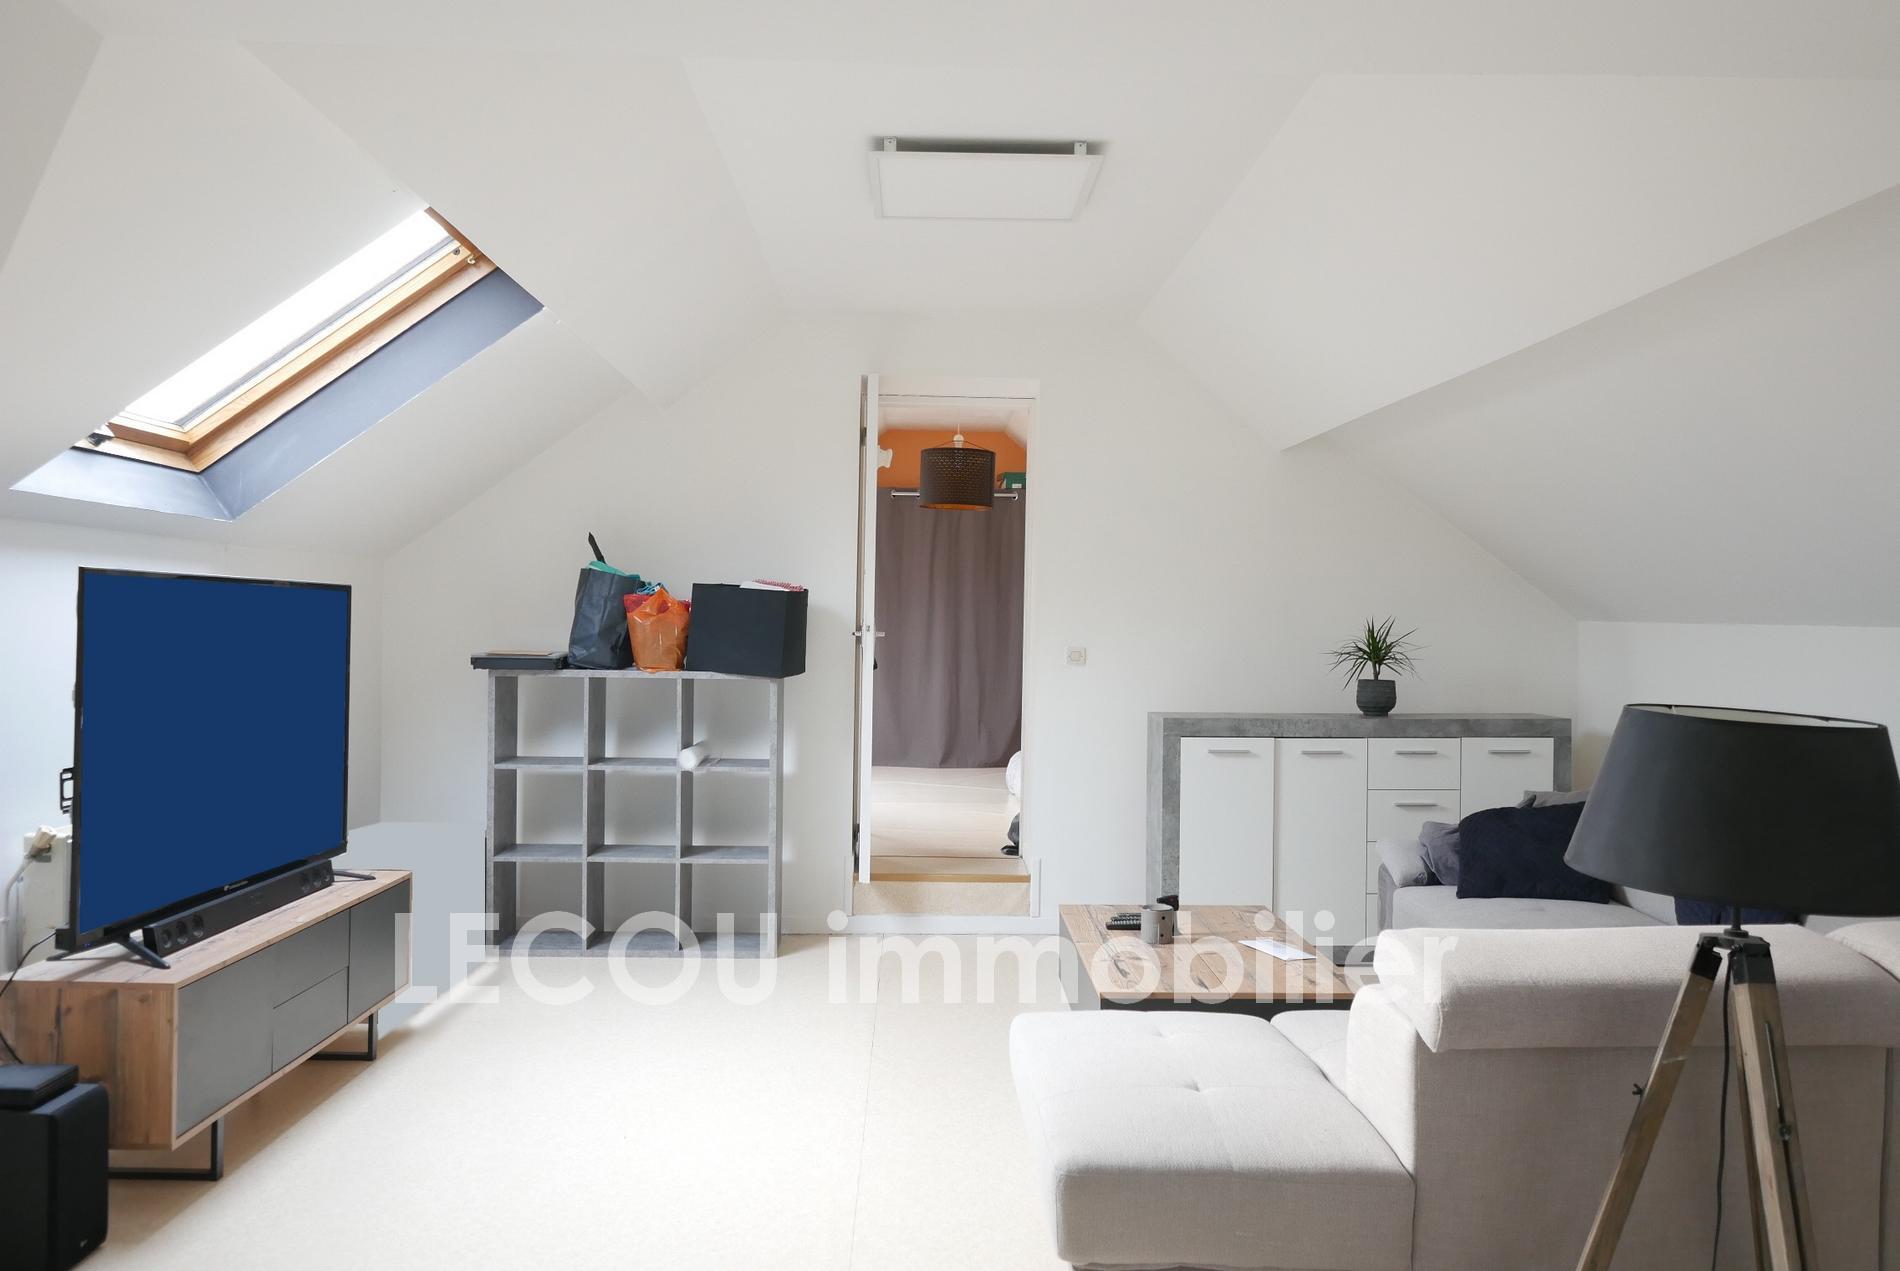 Appartement 55 m² en duplex